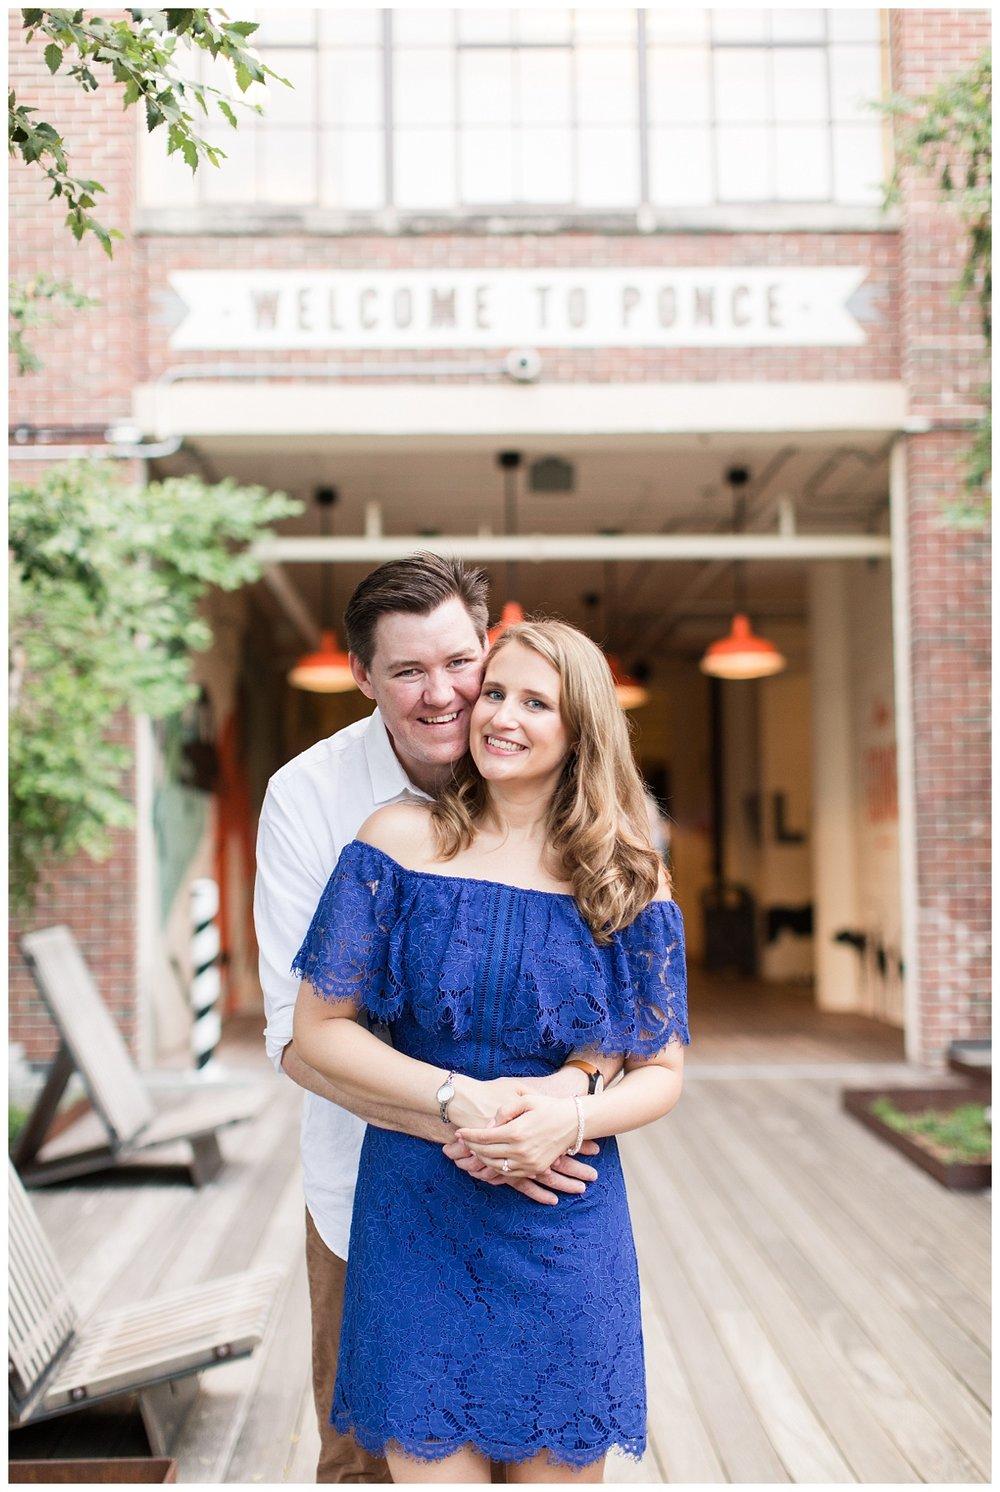 Engagement Pictures_KIm and Hamish_Abby Breaux Photography_Atlanta_Ponce City Market_Jackson Street Bridge_0049.jpg